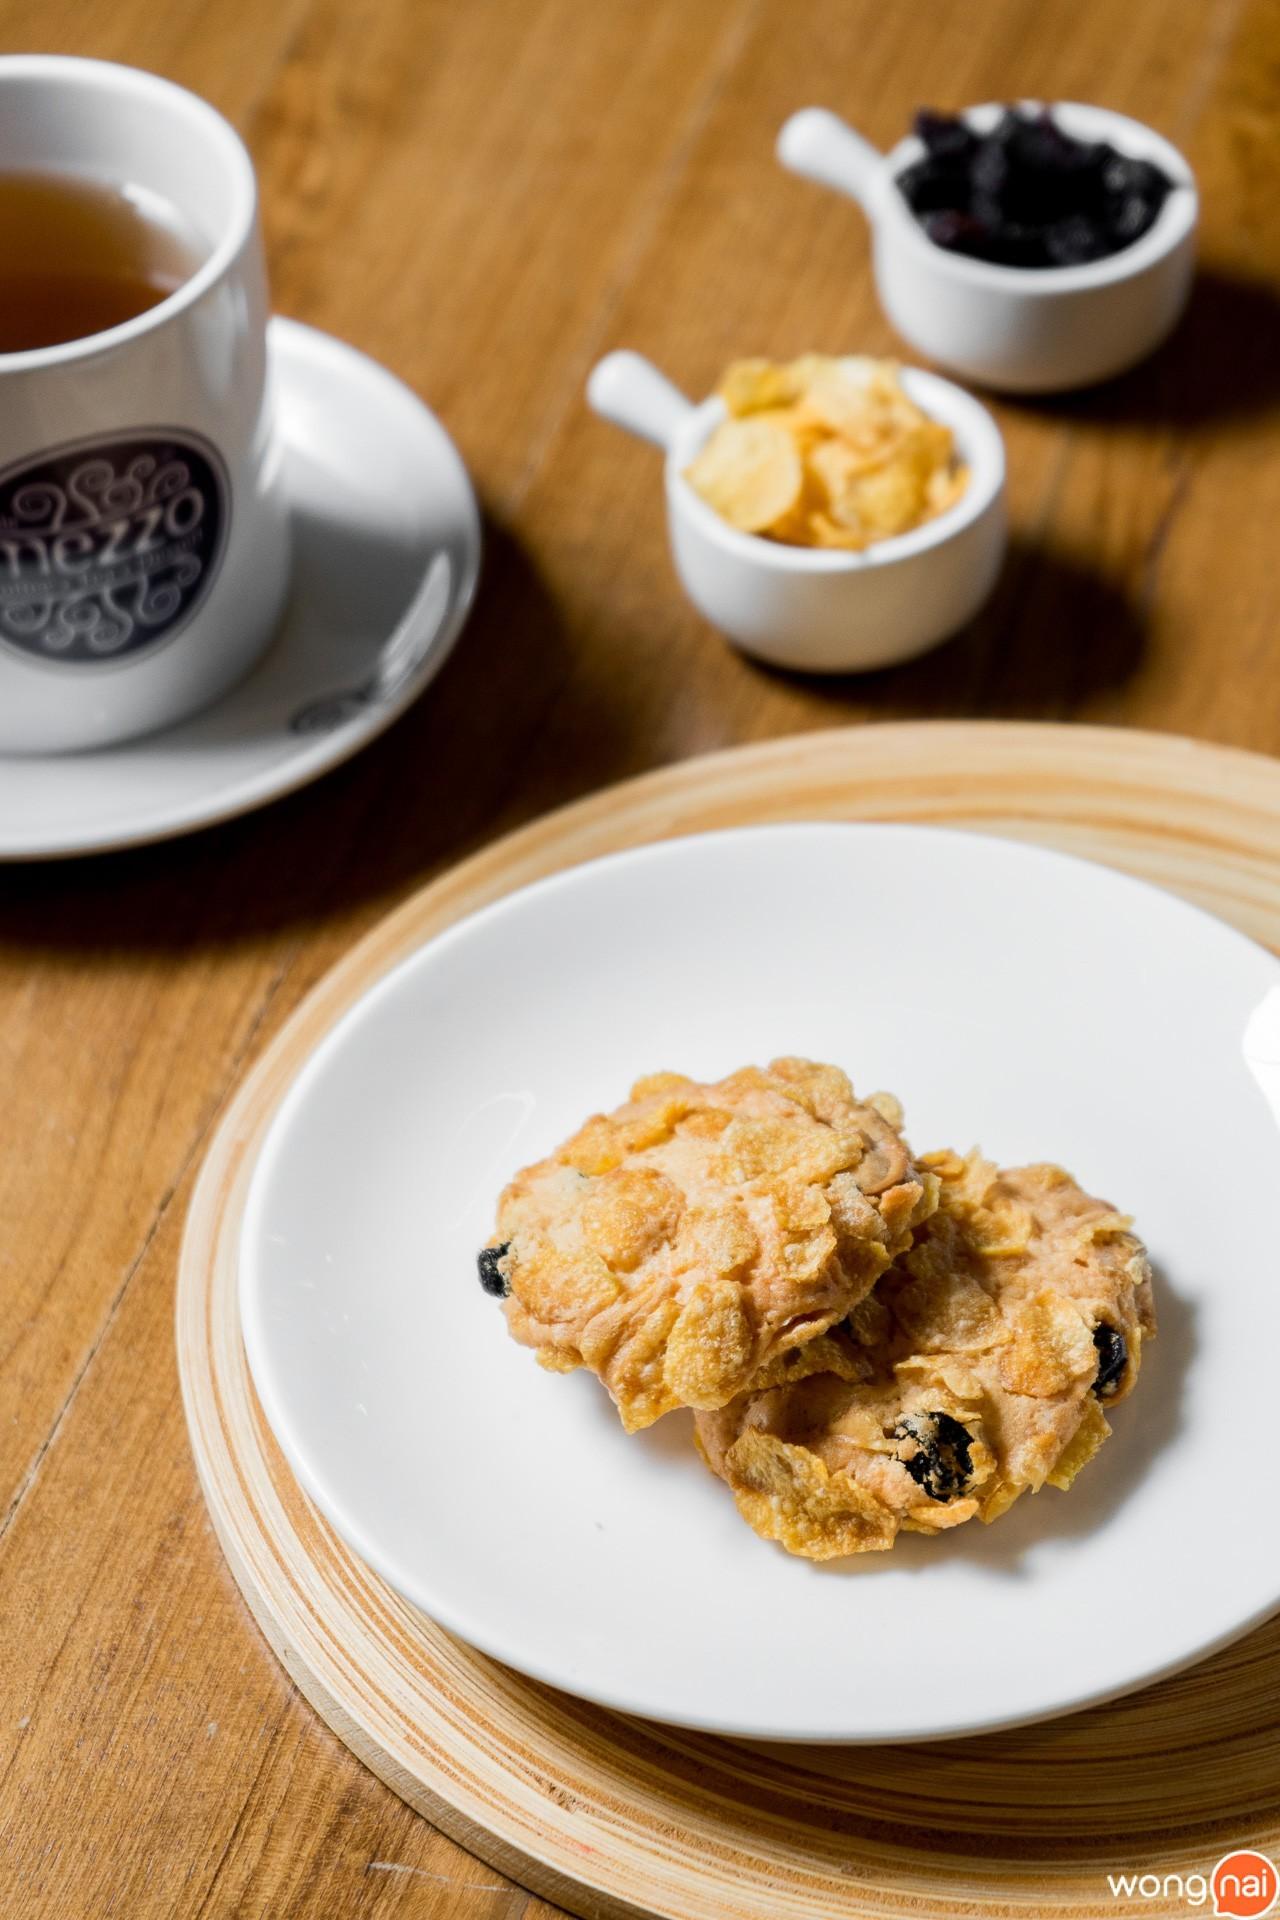 Cookies Conflakes Cashew Nuts ของ ร้านกาแฟและเบเกอรี Mezzo Coffee